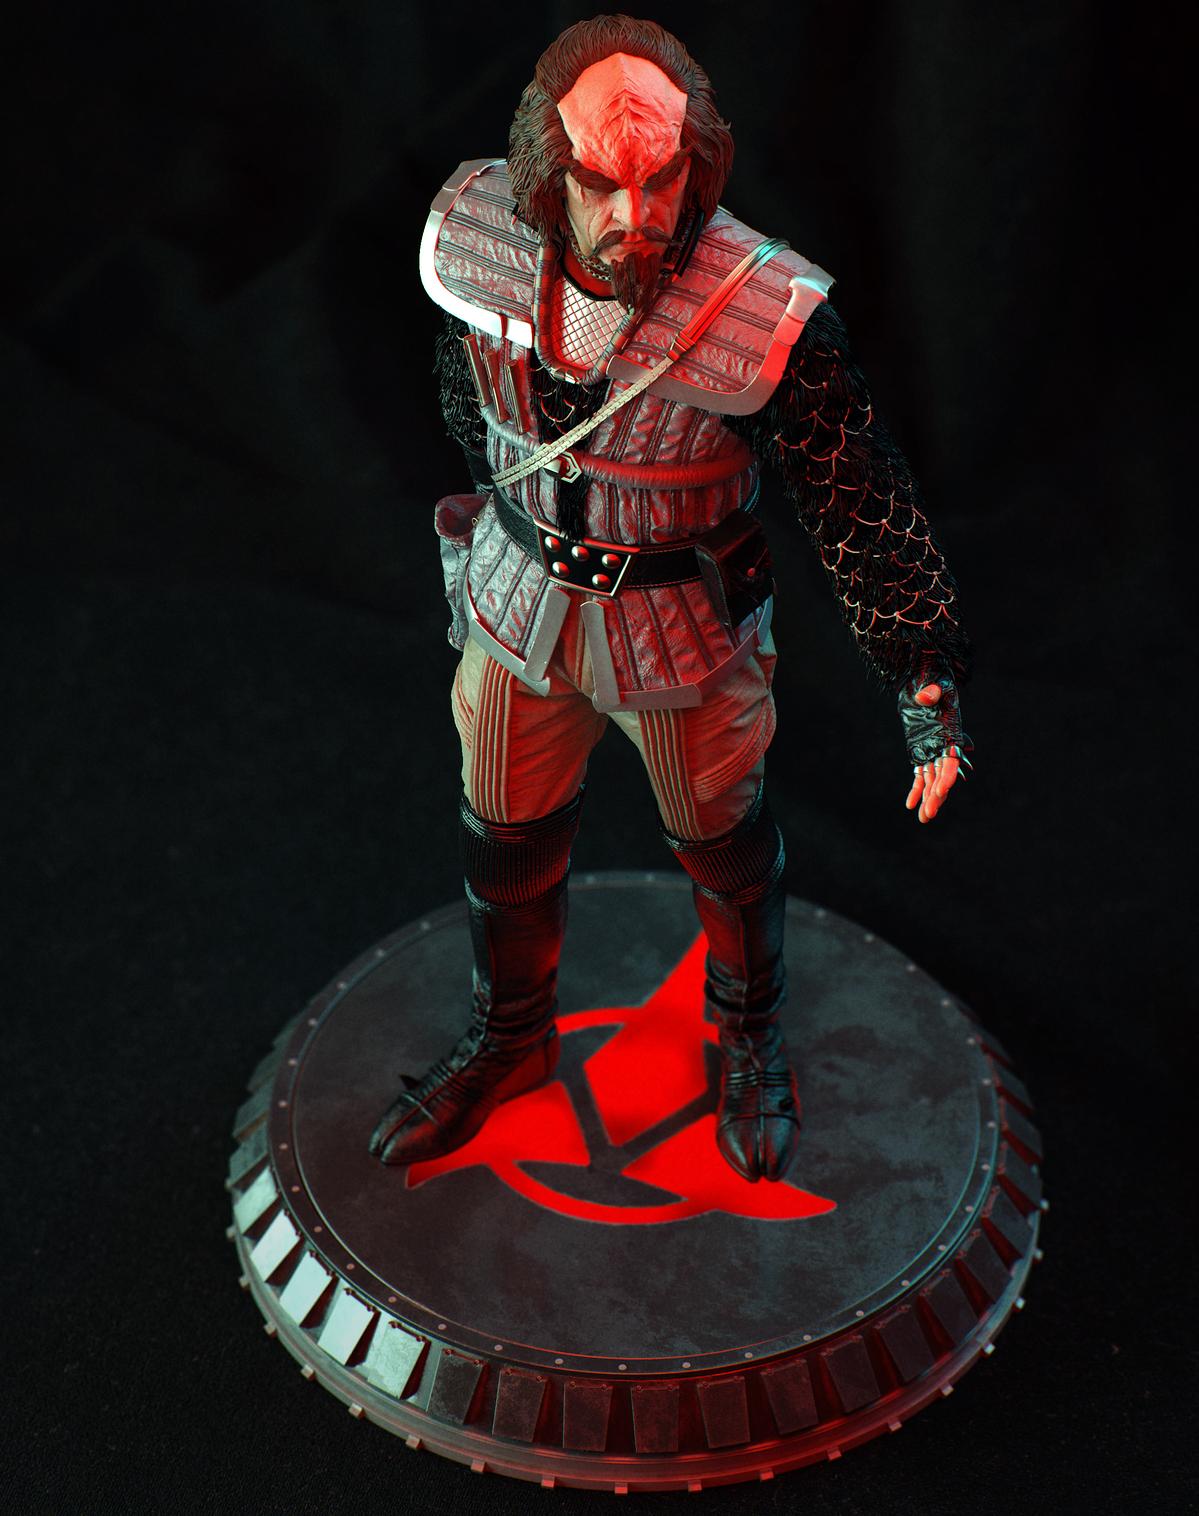 Klingon_Red_2